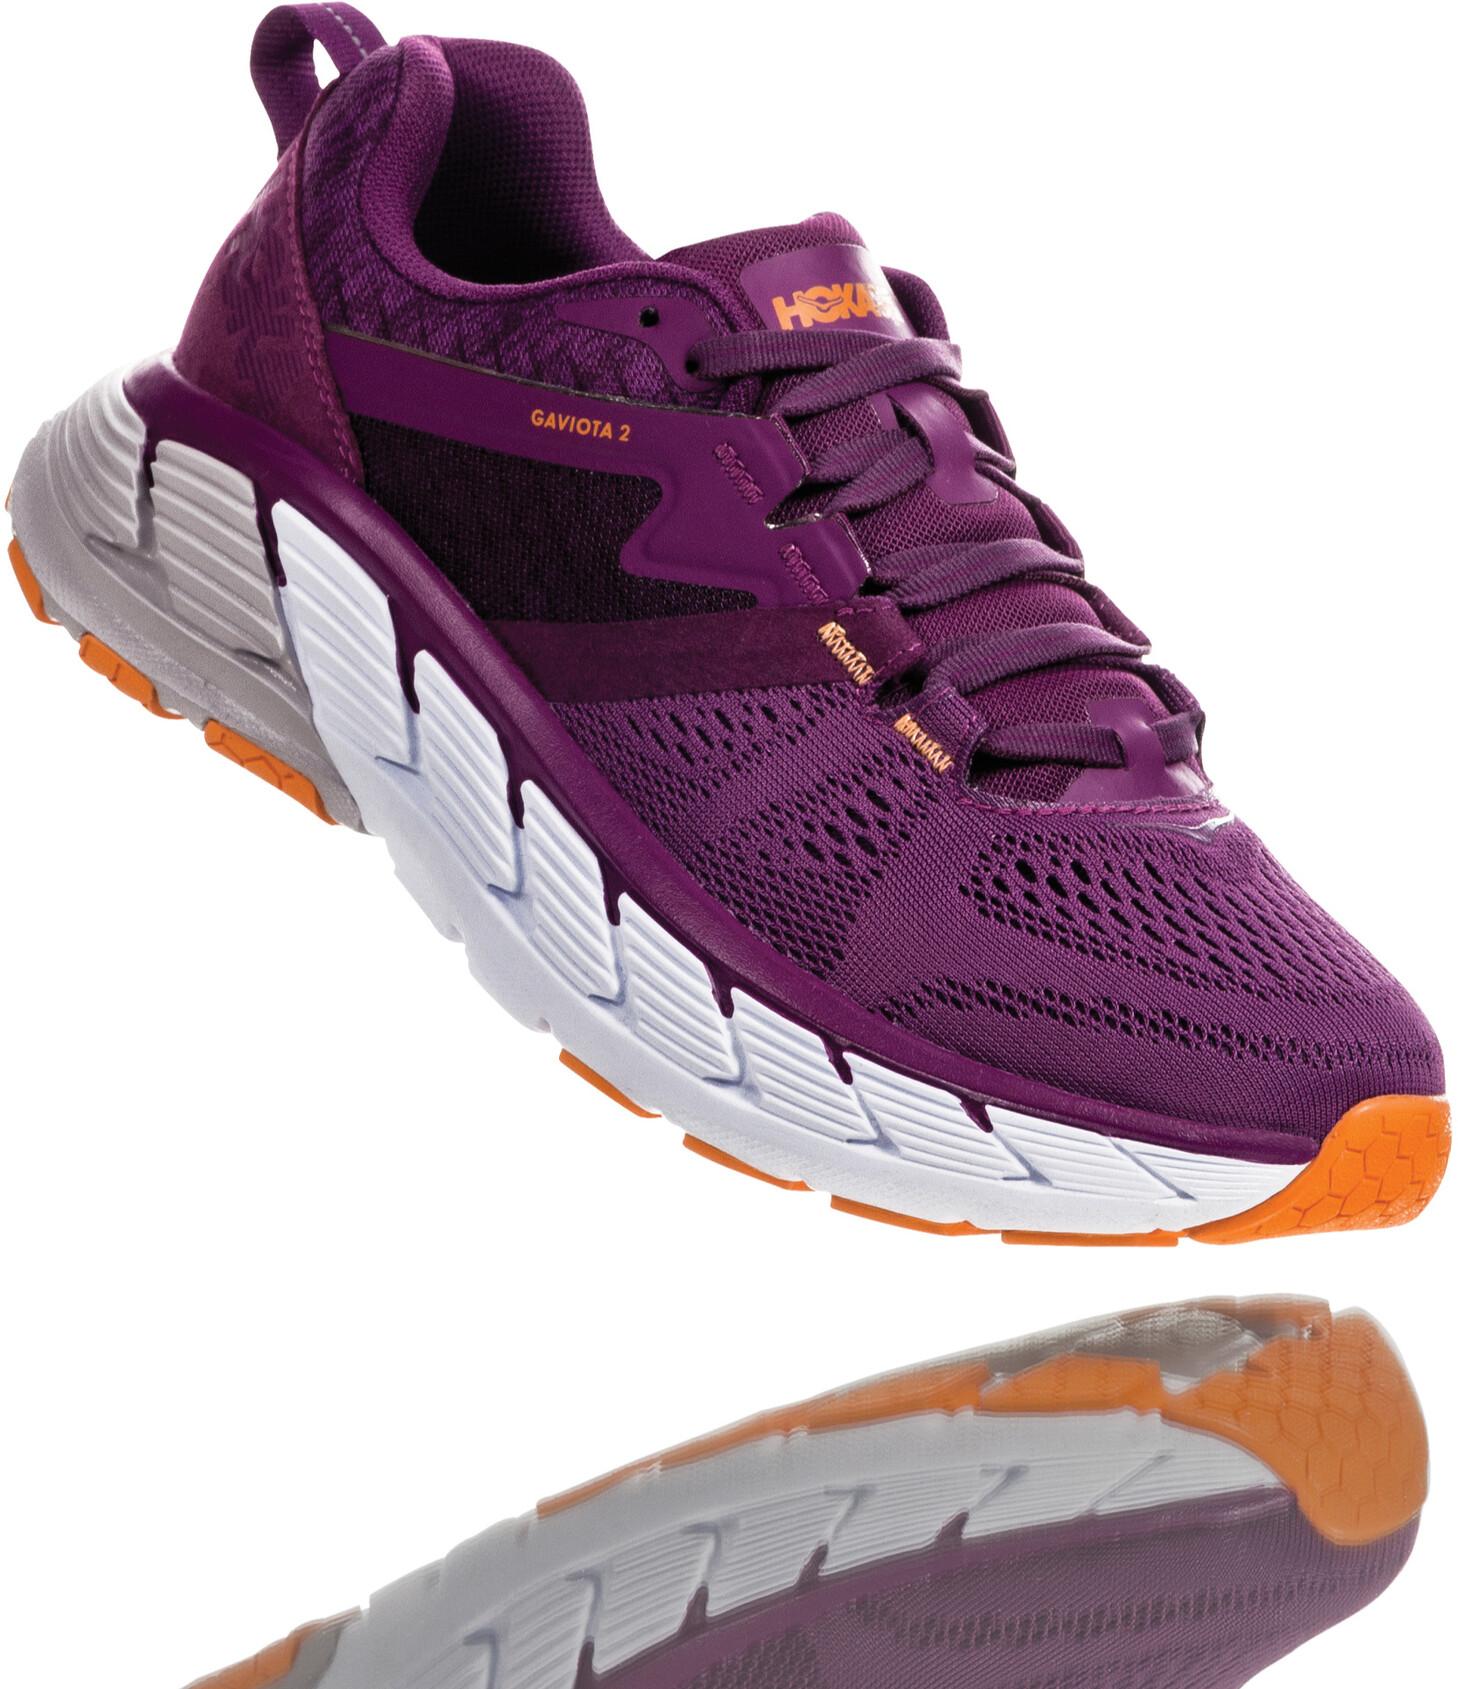 Hoka One One Gaviota 2 Løbesko Damer, grape juice/bright marigold (2020) | Running shoes